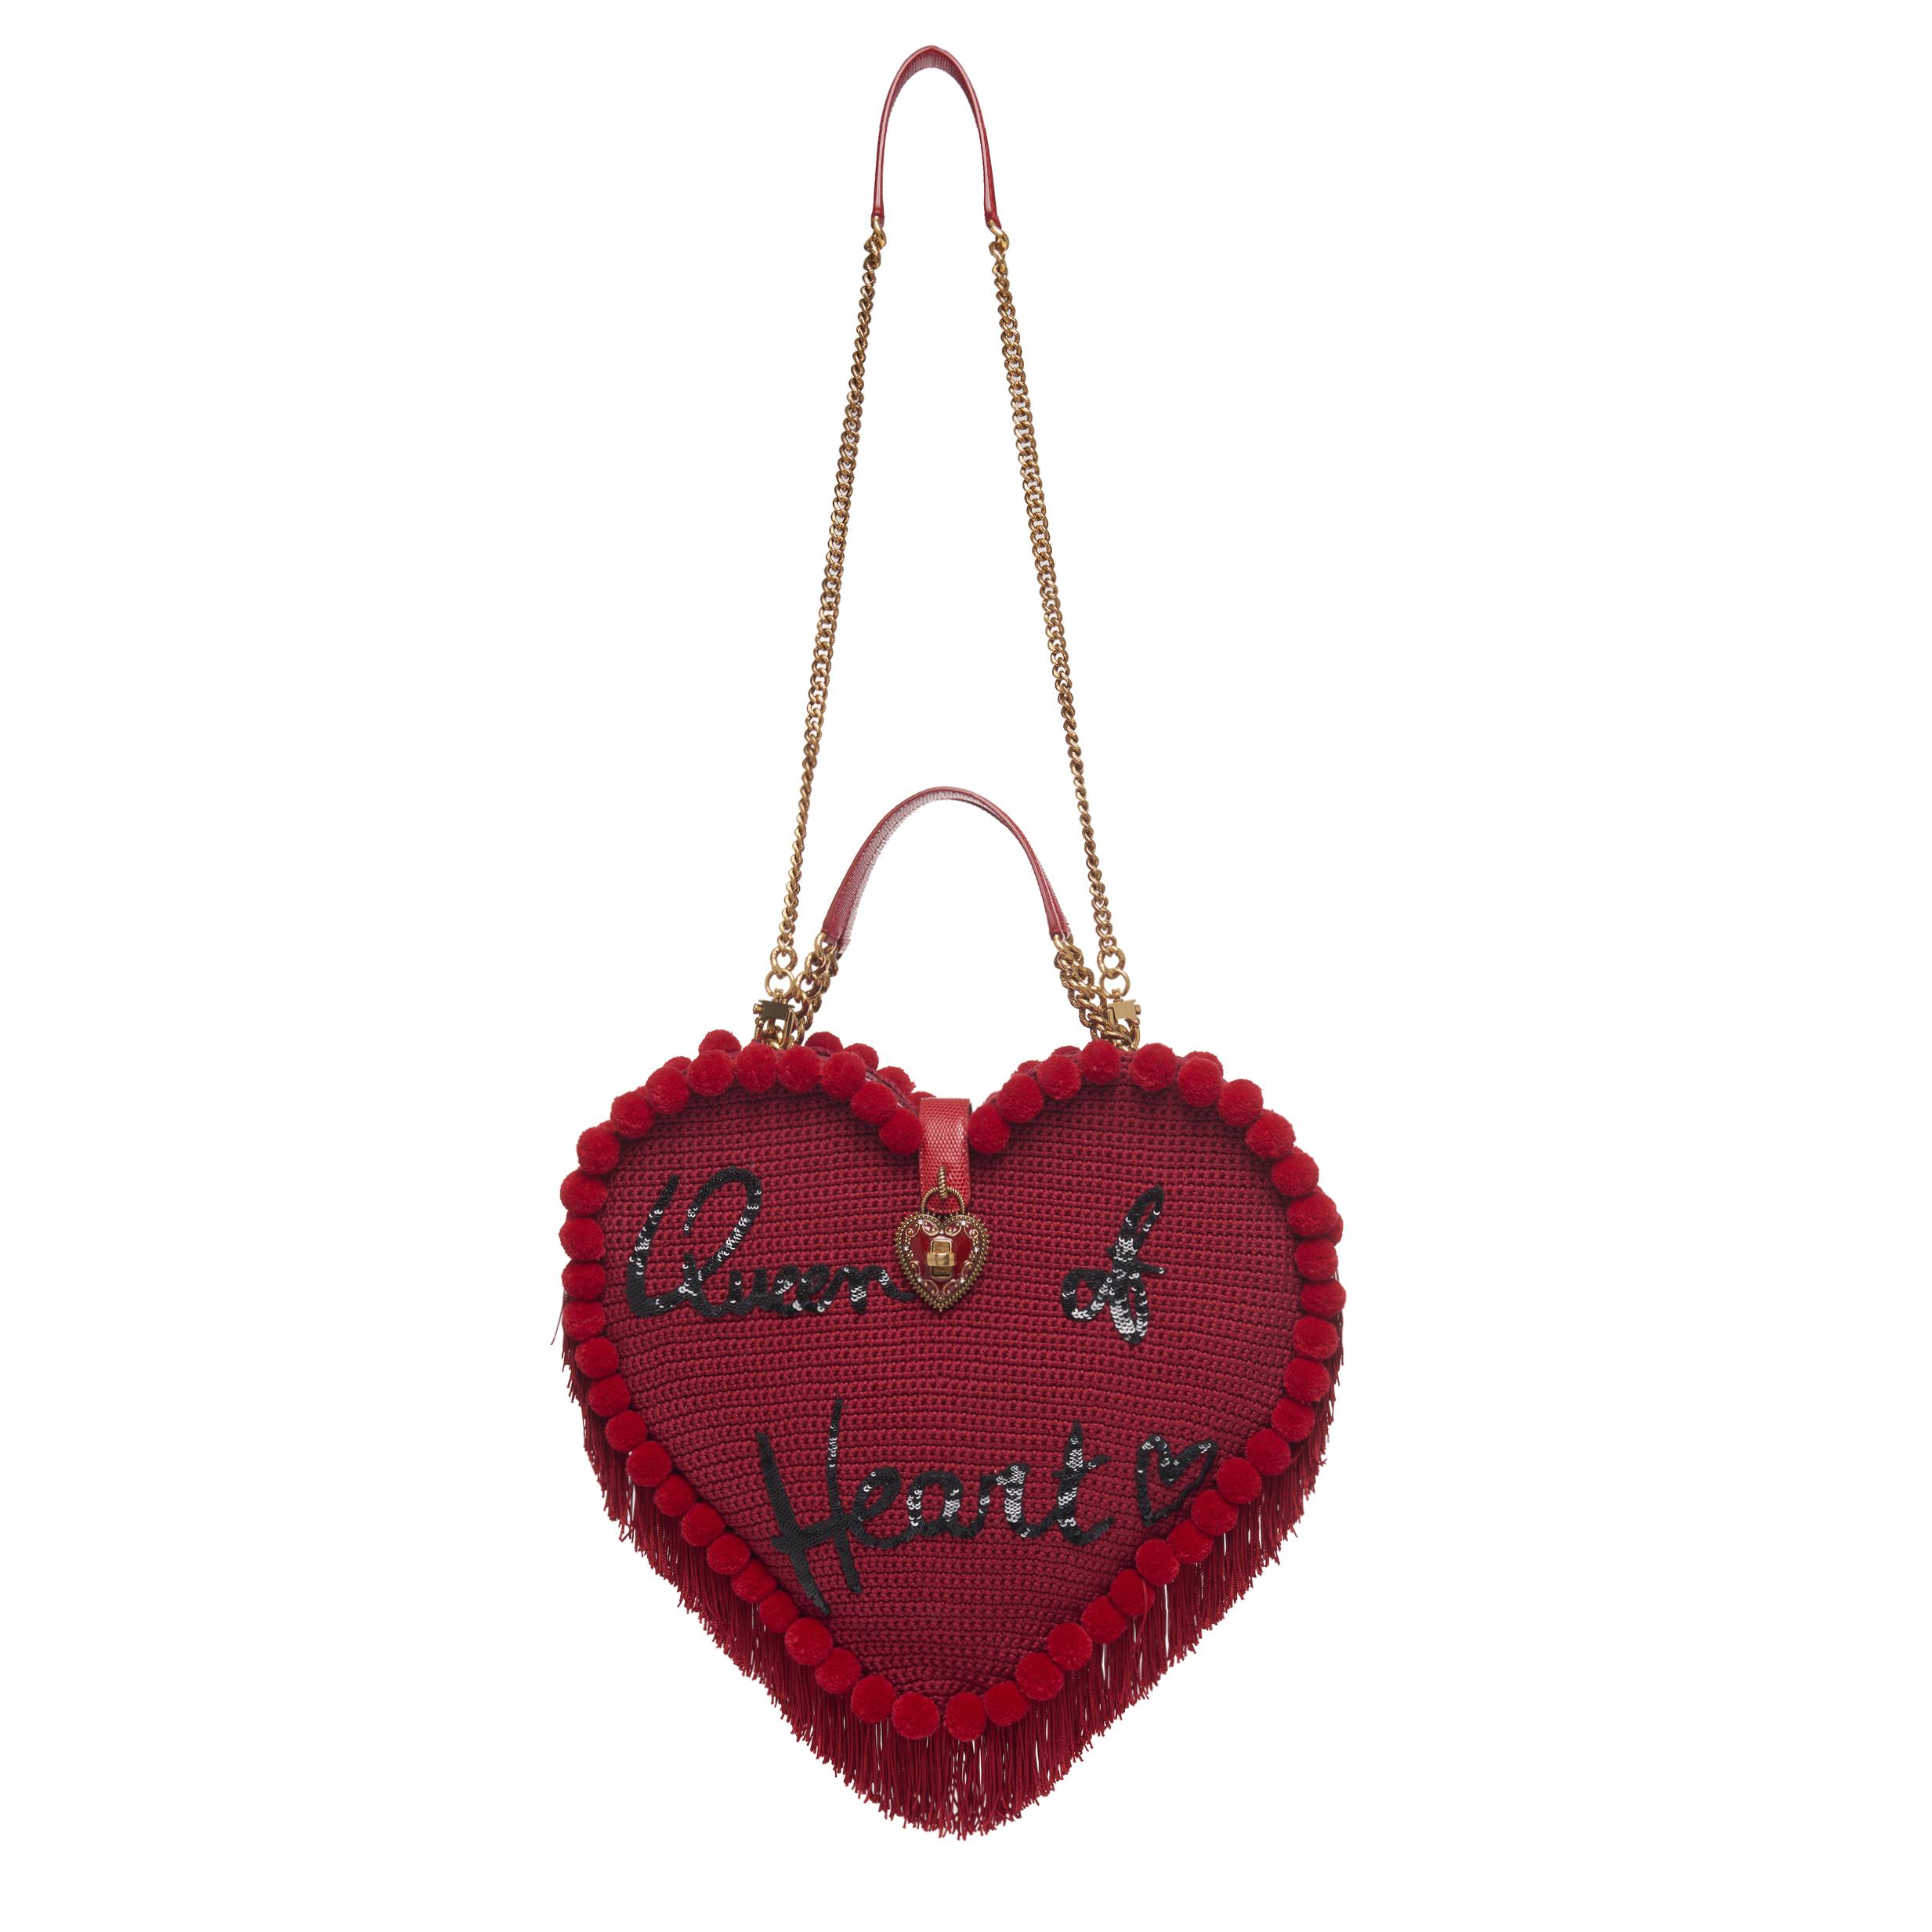 large_dolce-gabbana-red-my-heart-bag.jpg